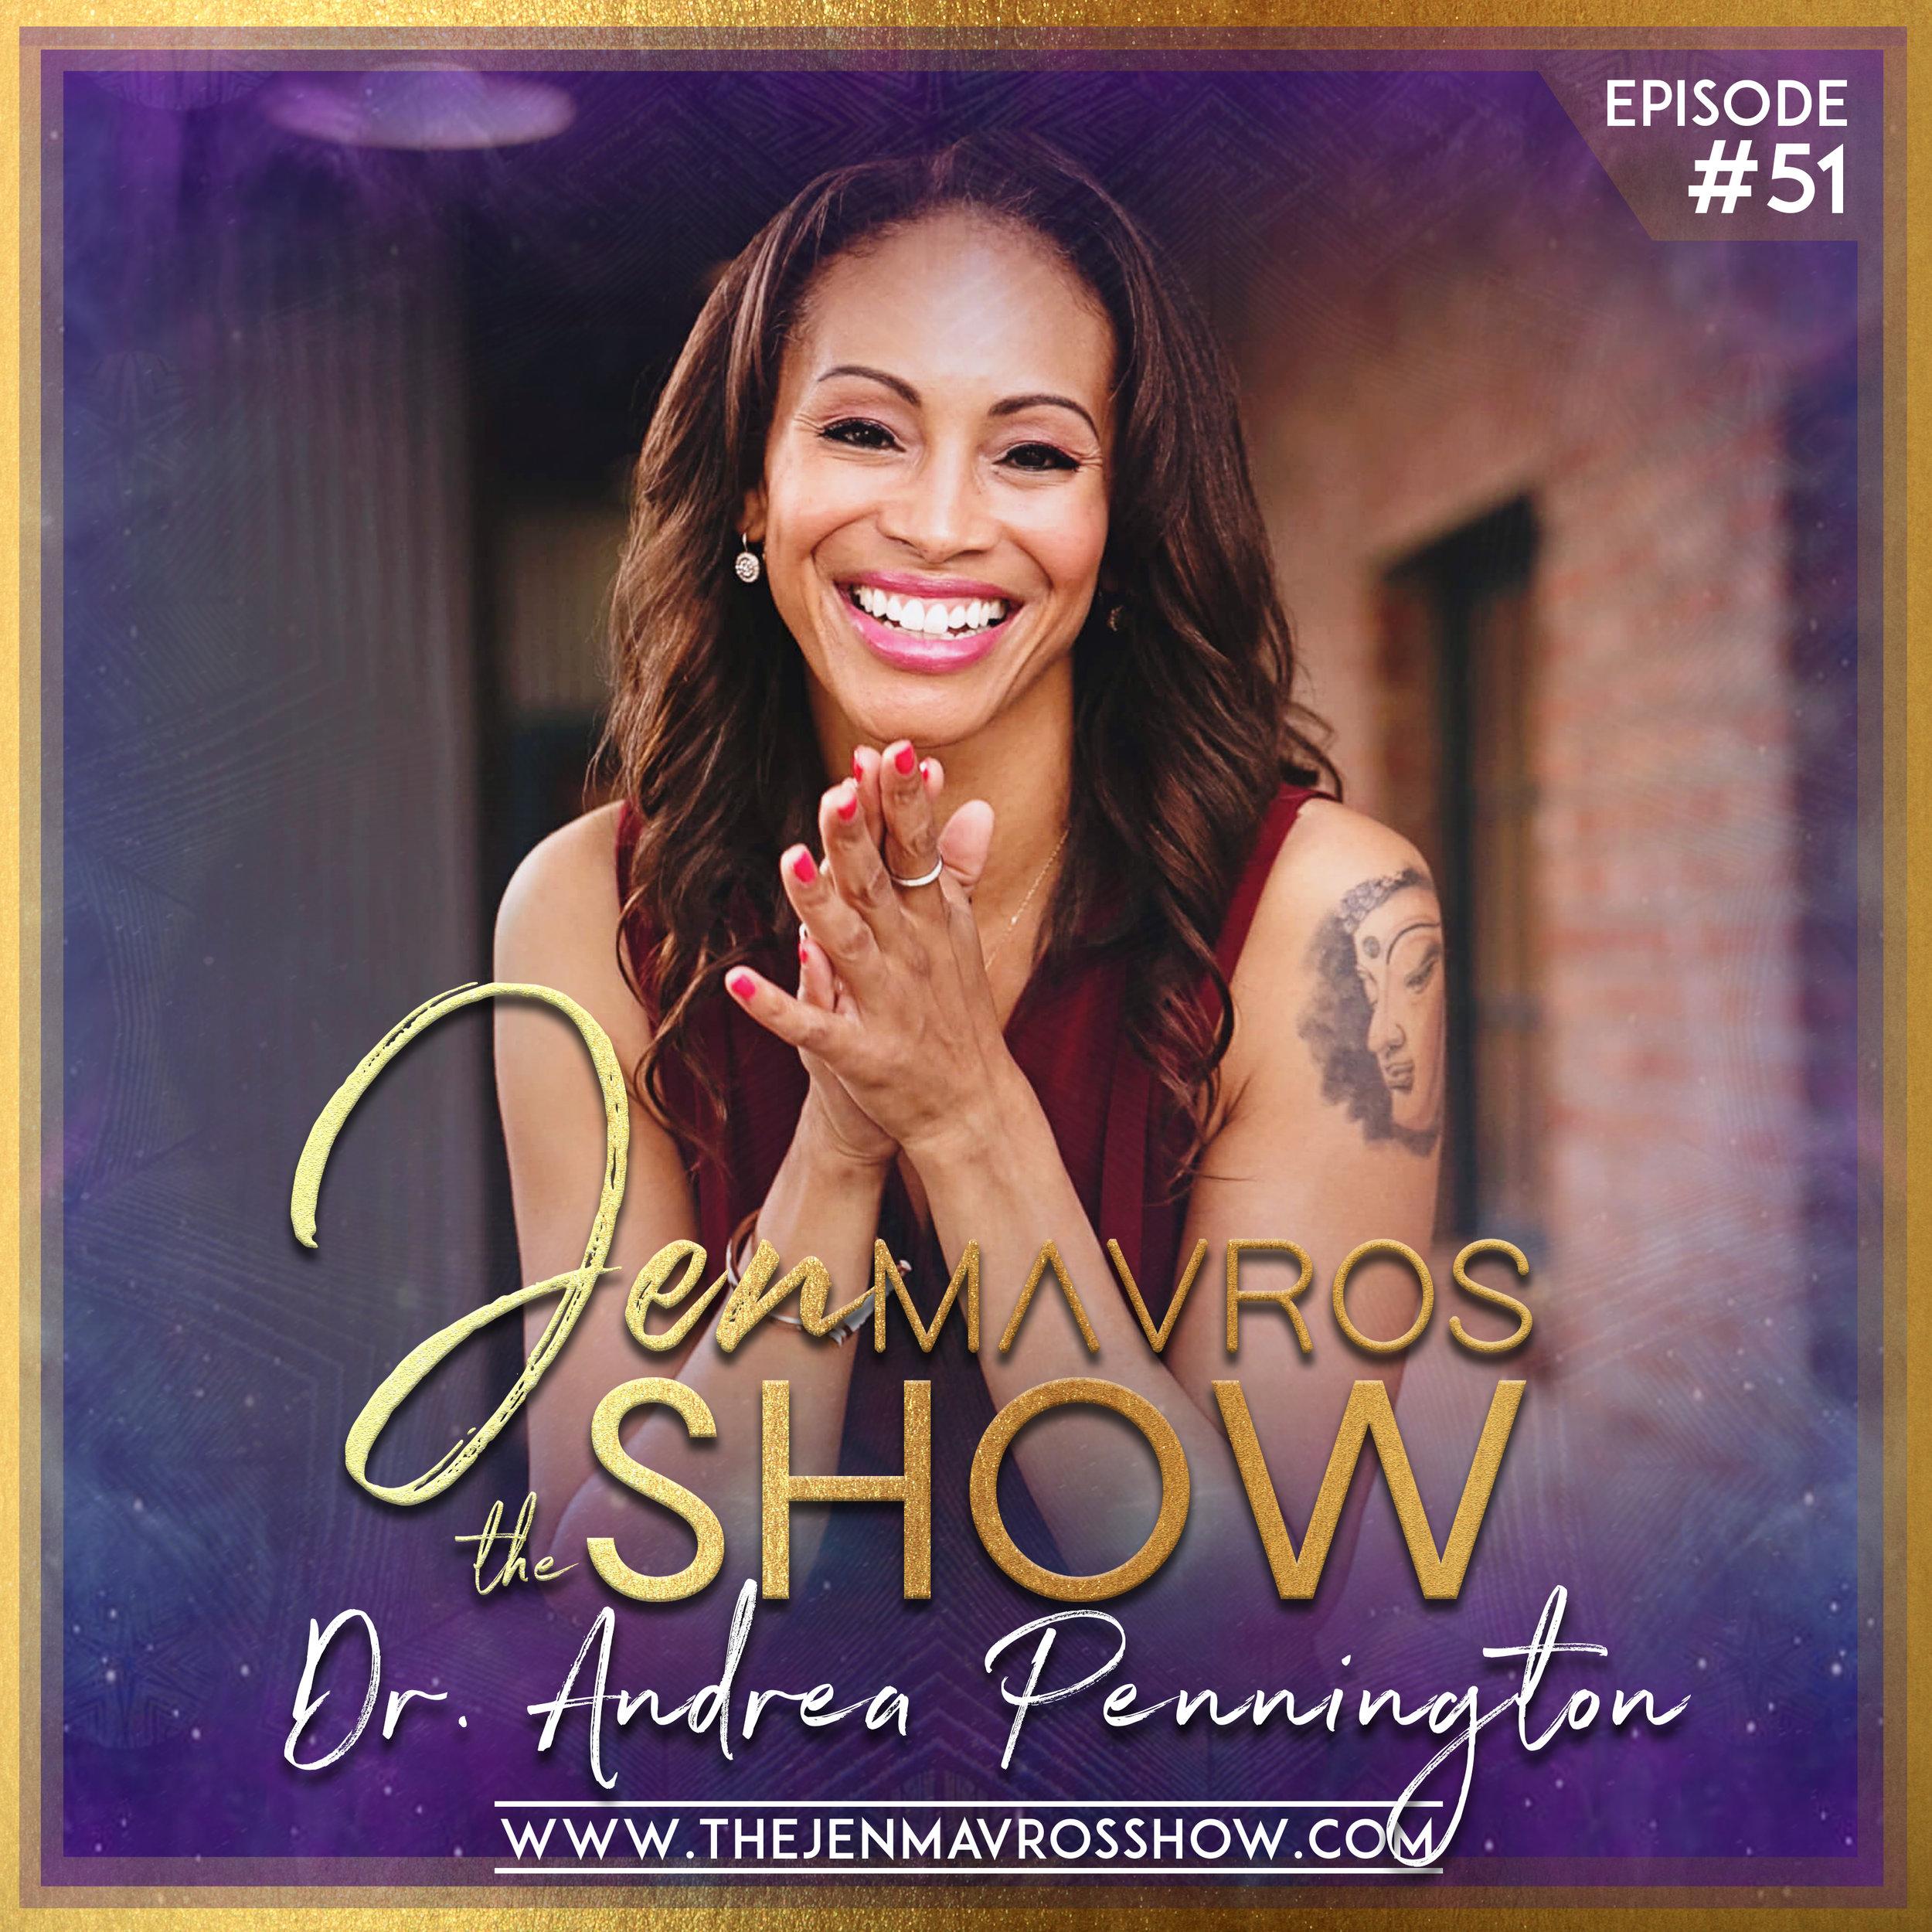 Dr. Andrea Pennington - I Love You, Me!